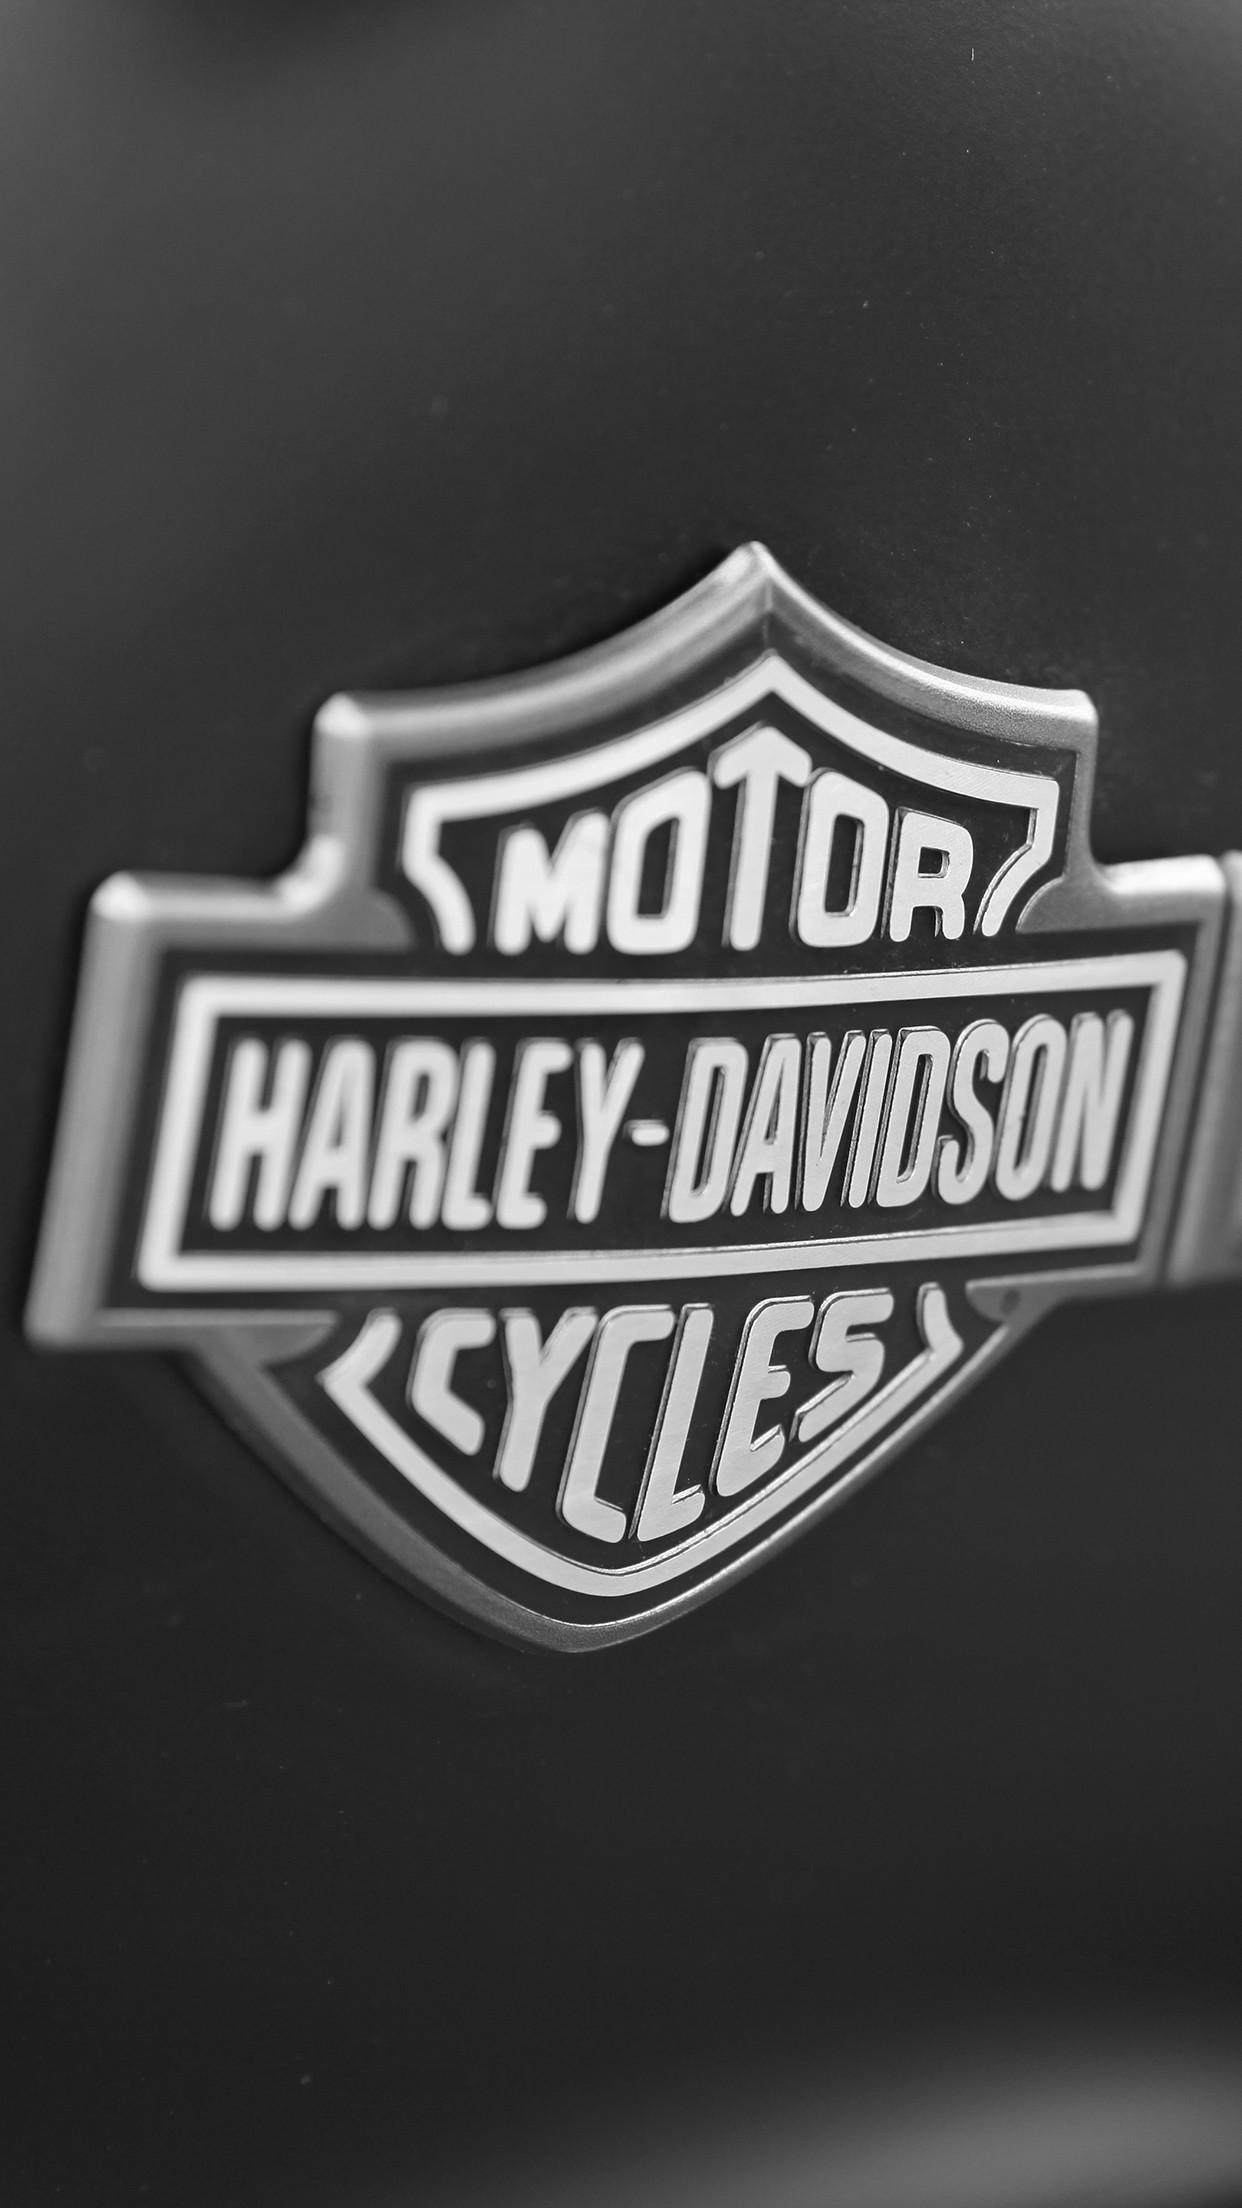 Harley Davidson Logo Wallpaper 183 ① Wallpapertag